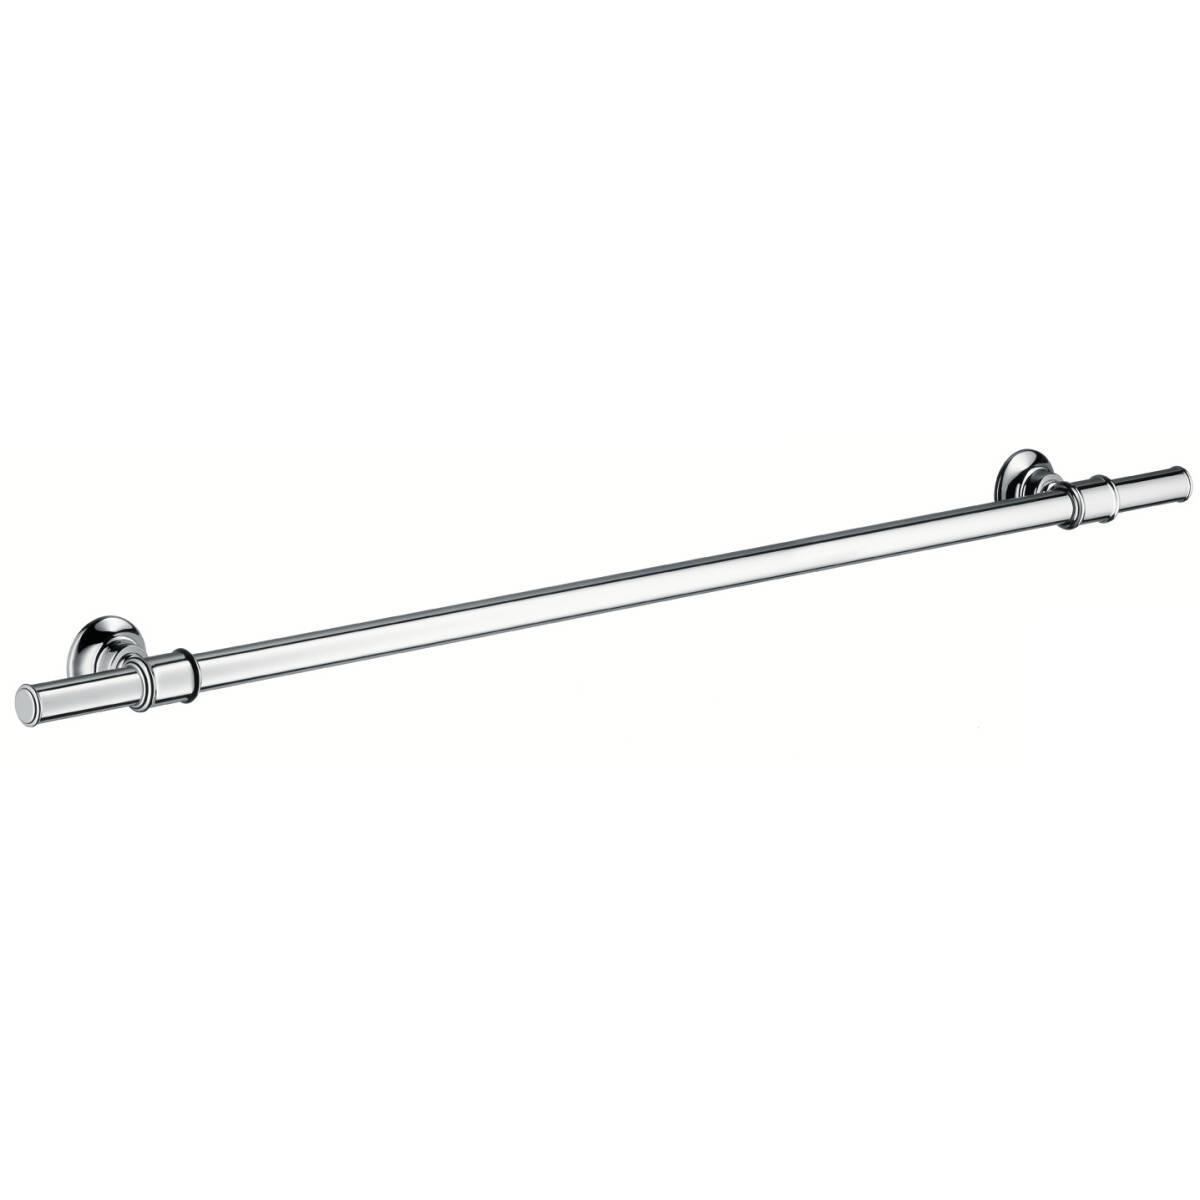 Bath towel rail 800 mm, Brushed Nickel, 42080820